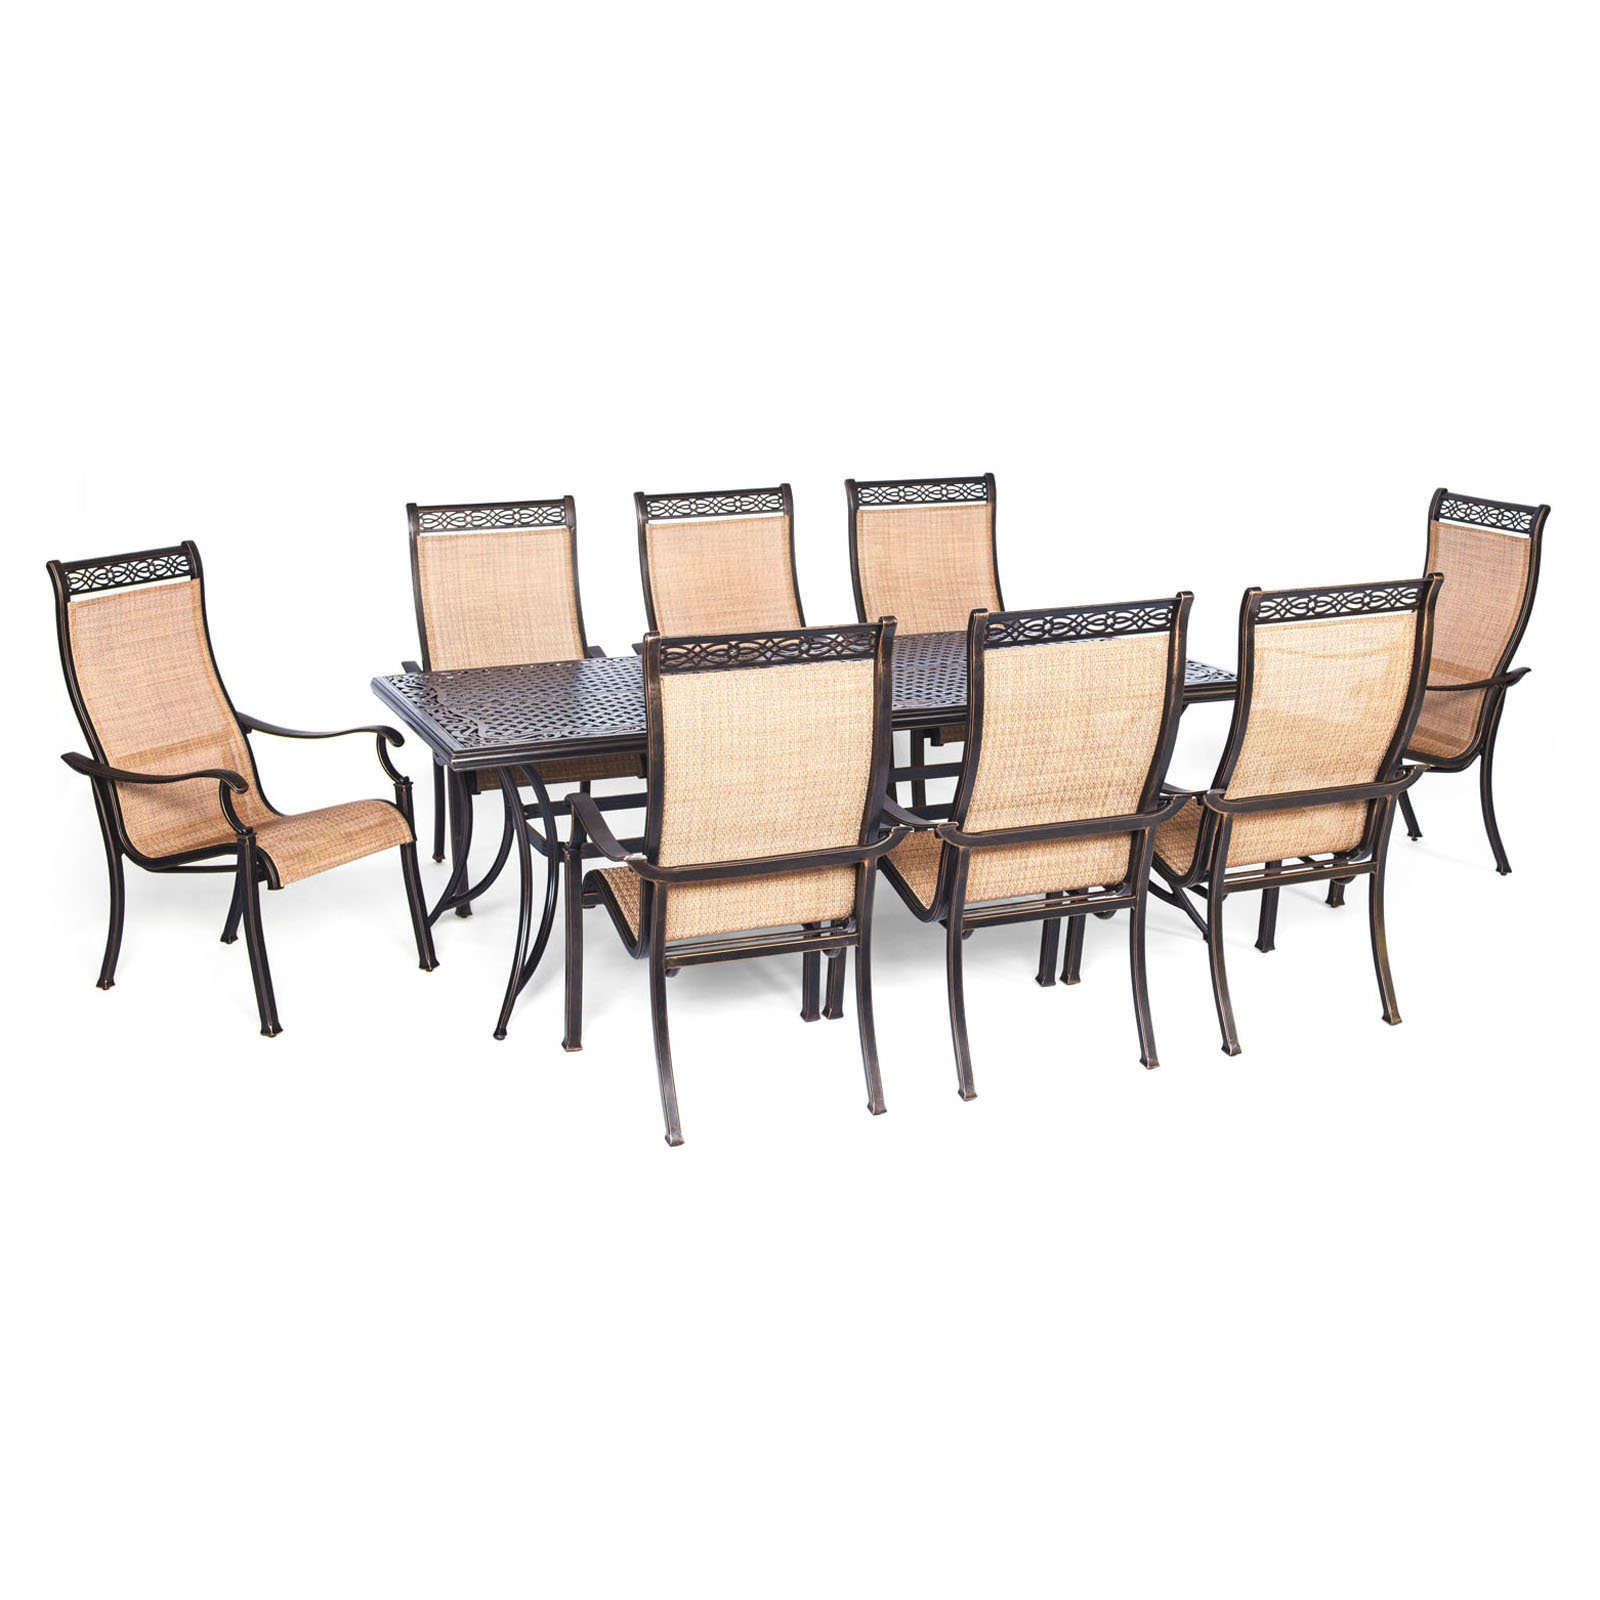 home table set designs piece malibu vifah patio depot sets dining square the